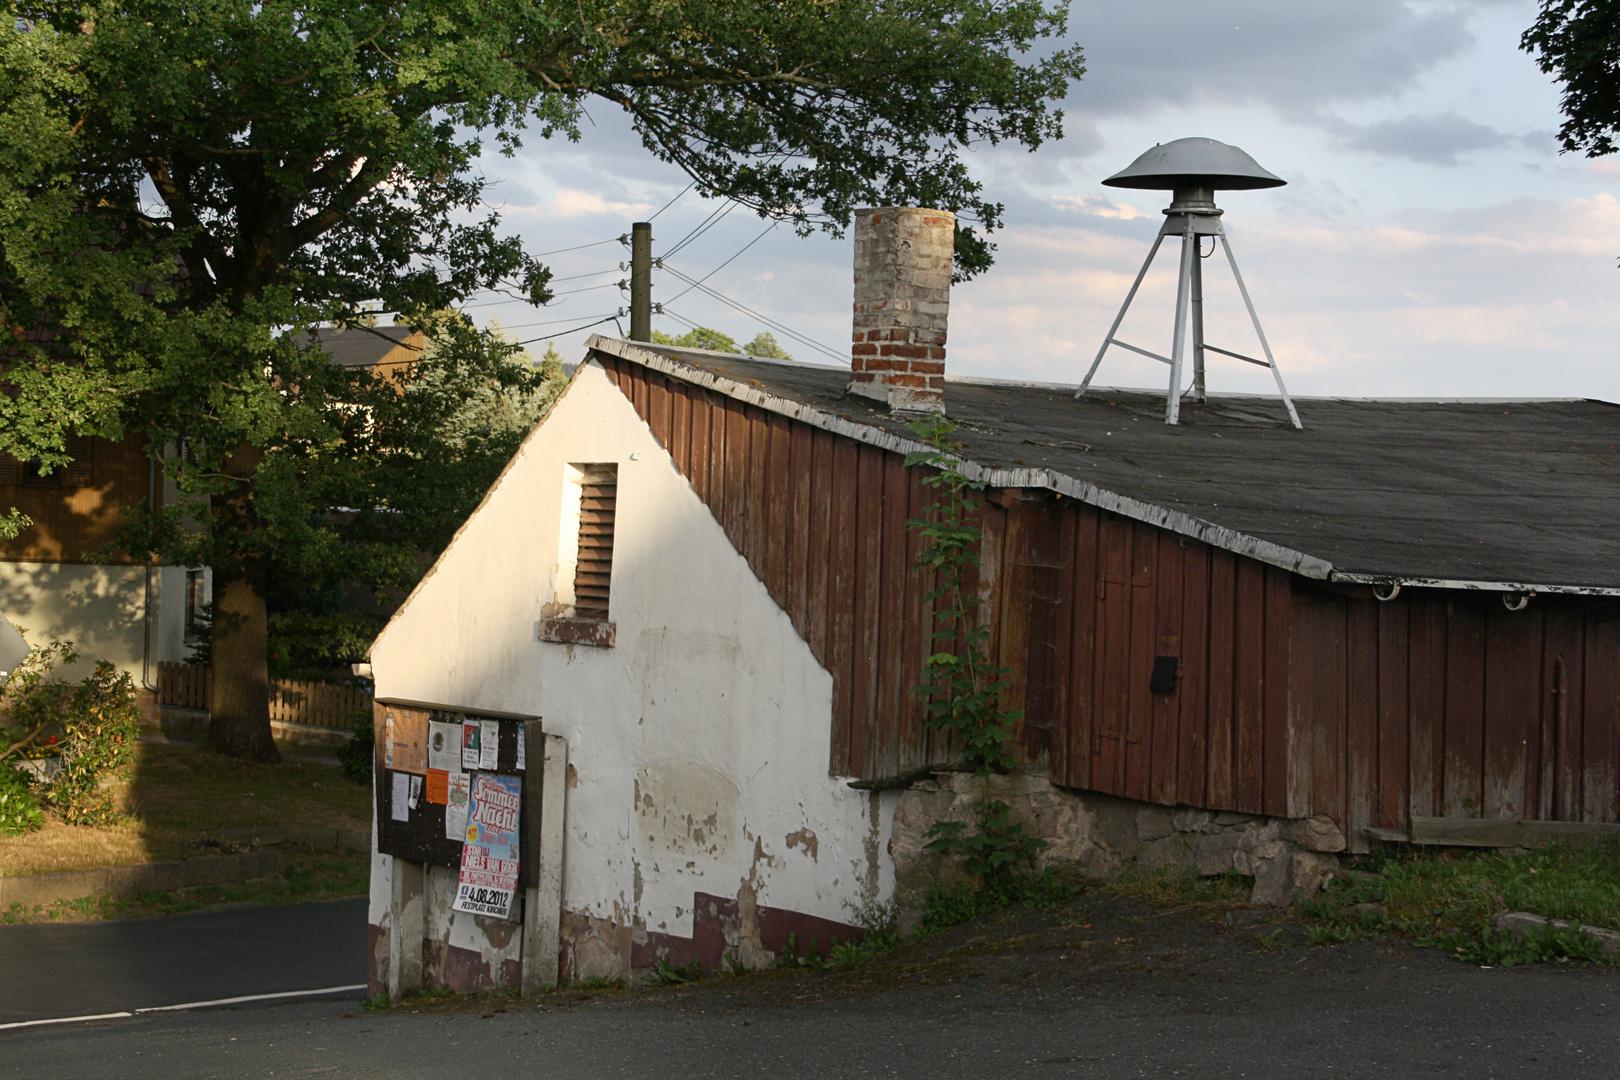 das alte spritzenhaus